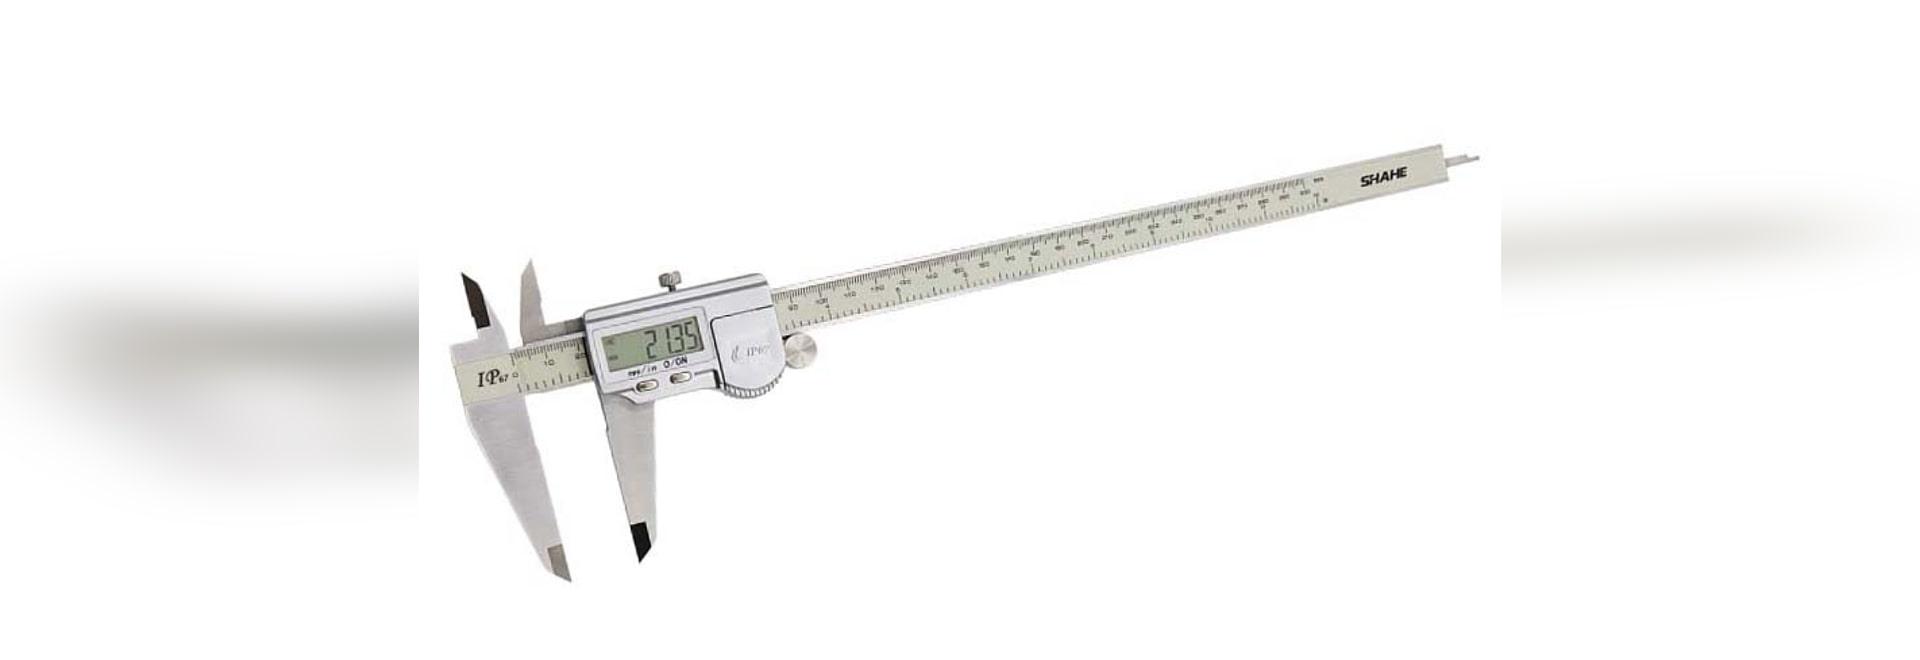 SHAHE/5111-300 0-300mm 0.01mm ±0.04mm/Digital Caliper IP67